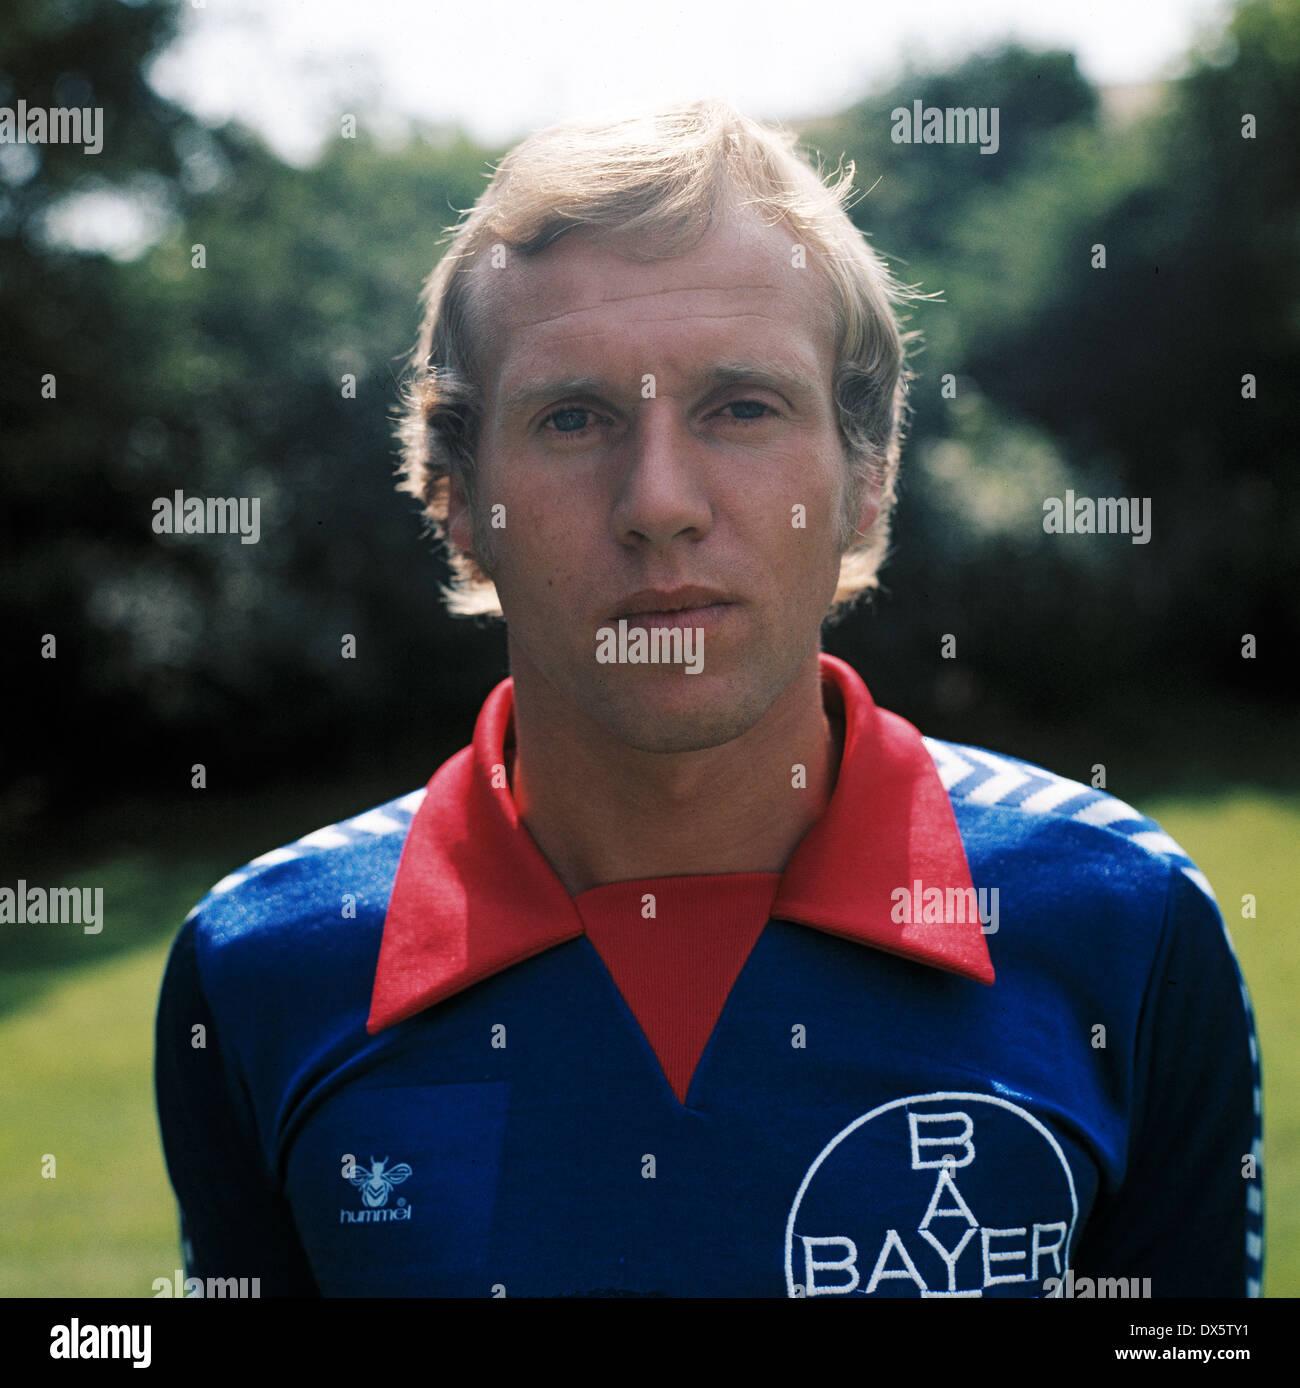 football, 2. Bundesliga Nord, 1977/1978, FC Bayer 05 Uerdingen, team presentation, portrait Jens Steffensen - Stock Image